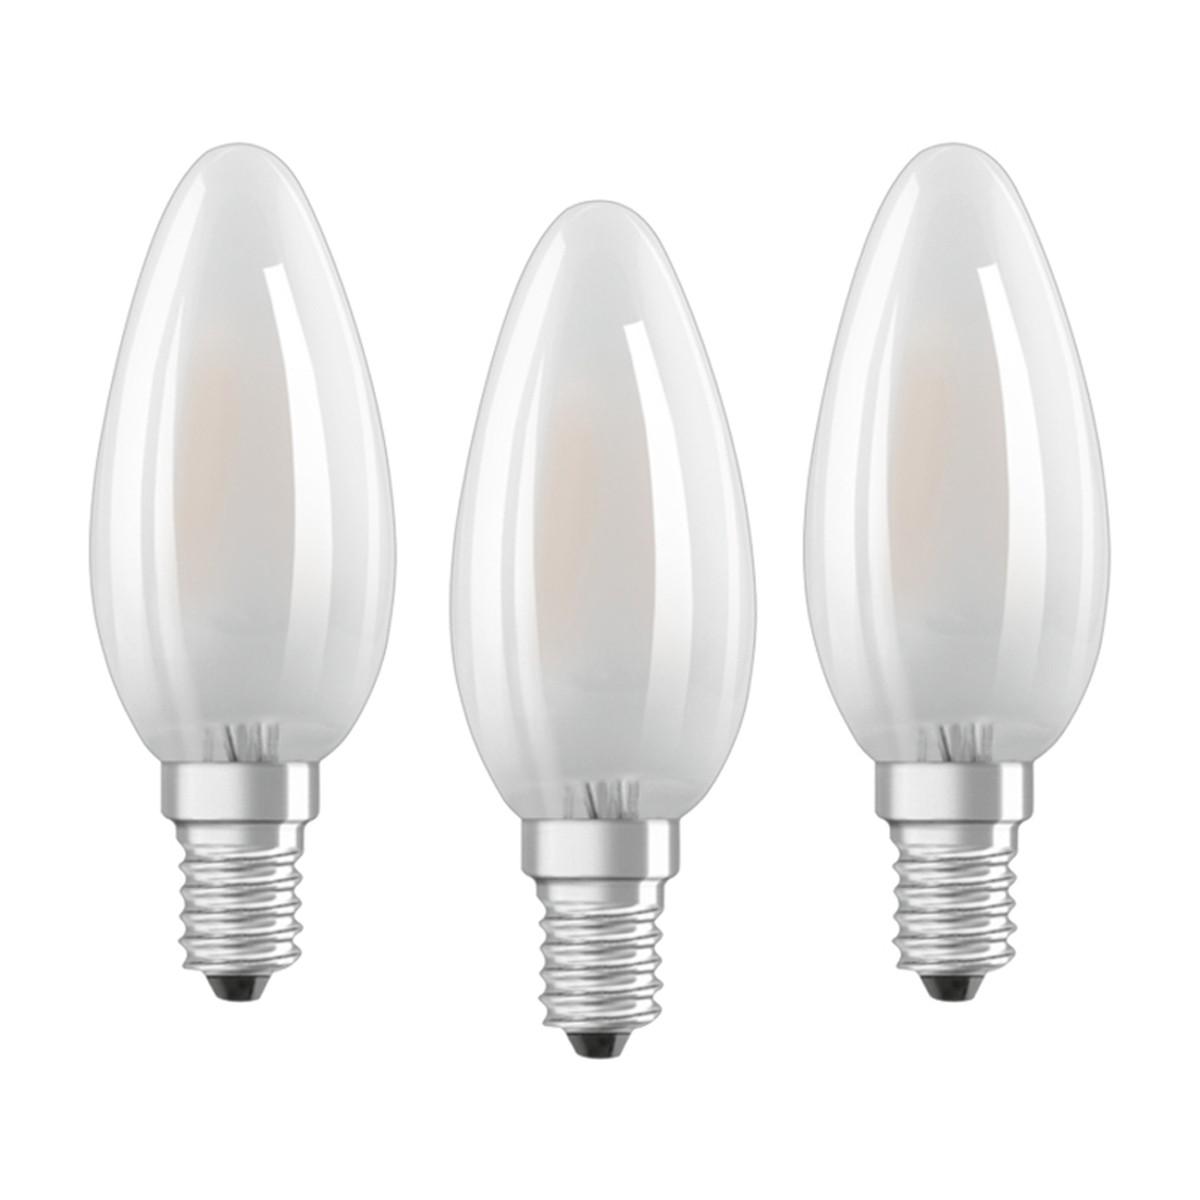 470 lm E27 4W ersetzt 40W Warmweiß 2700 K 10x Neolux LED-Lampe